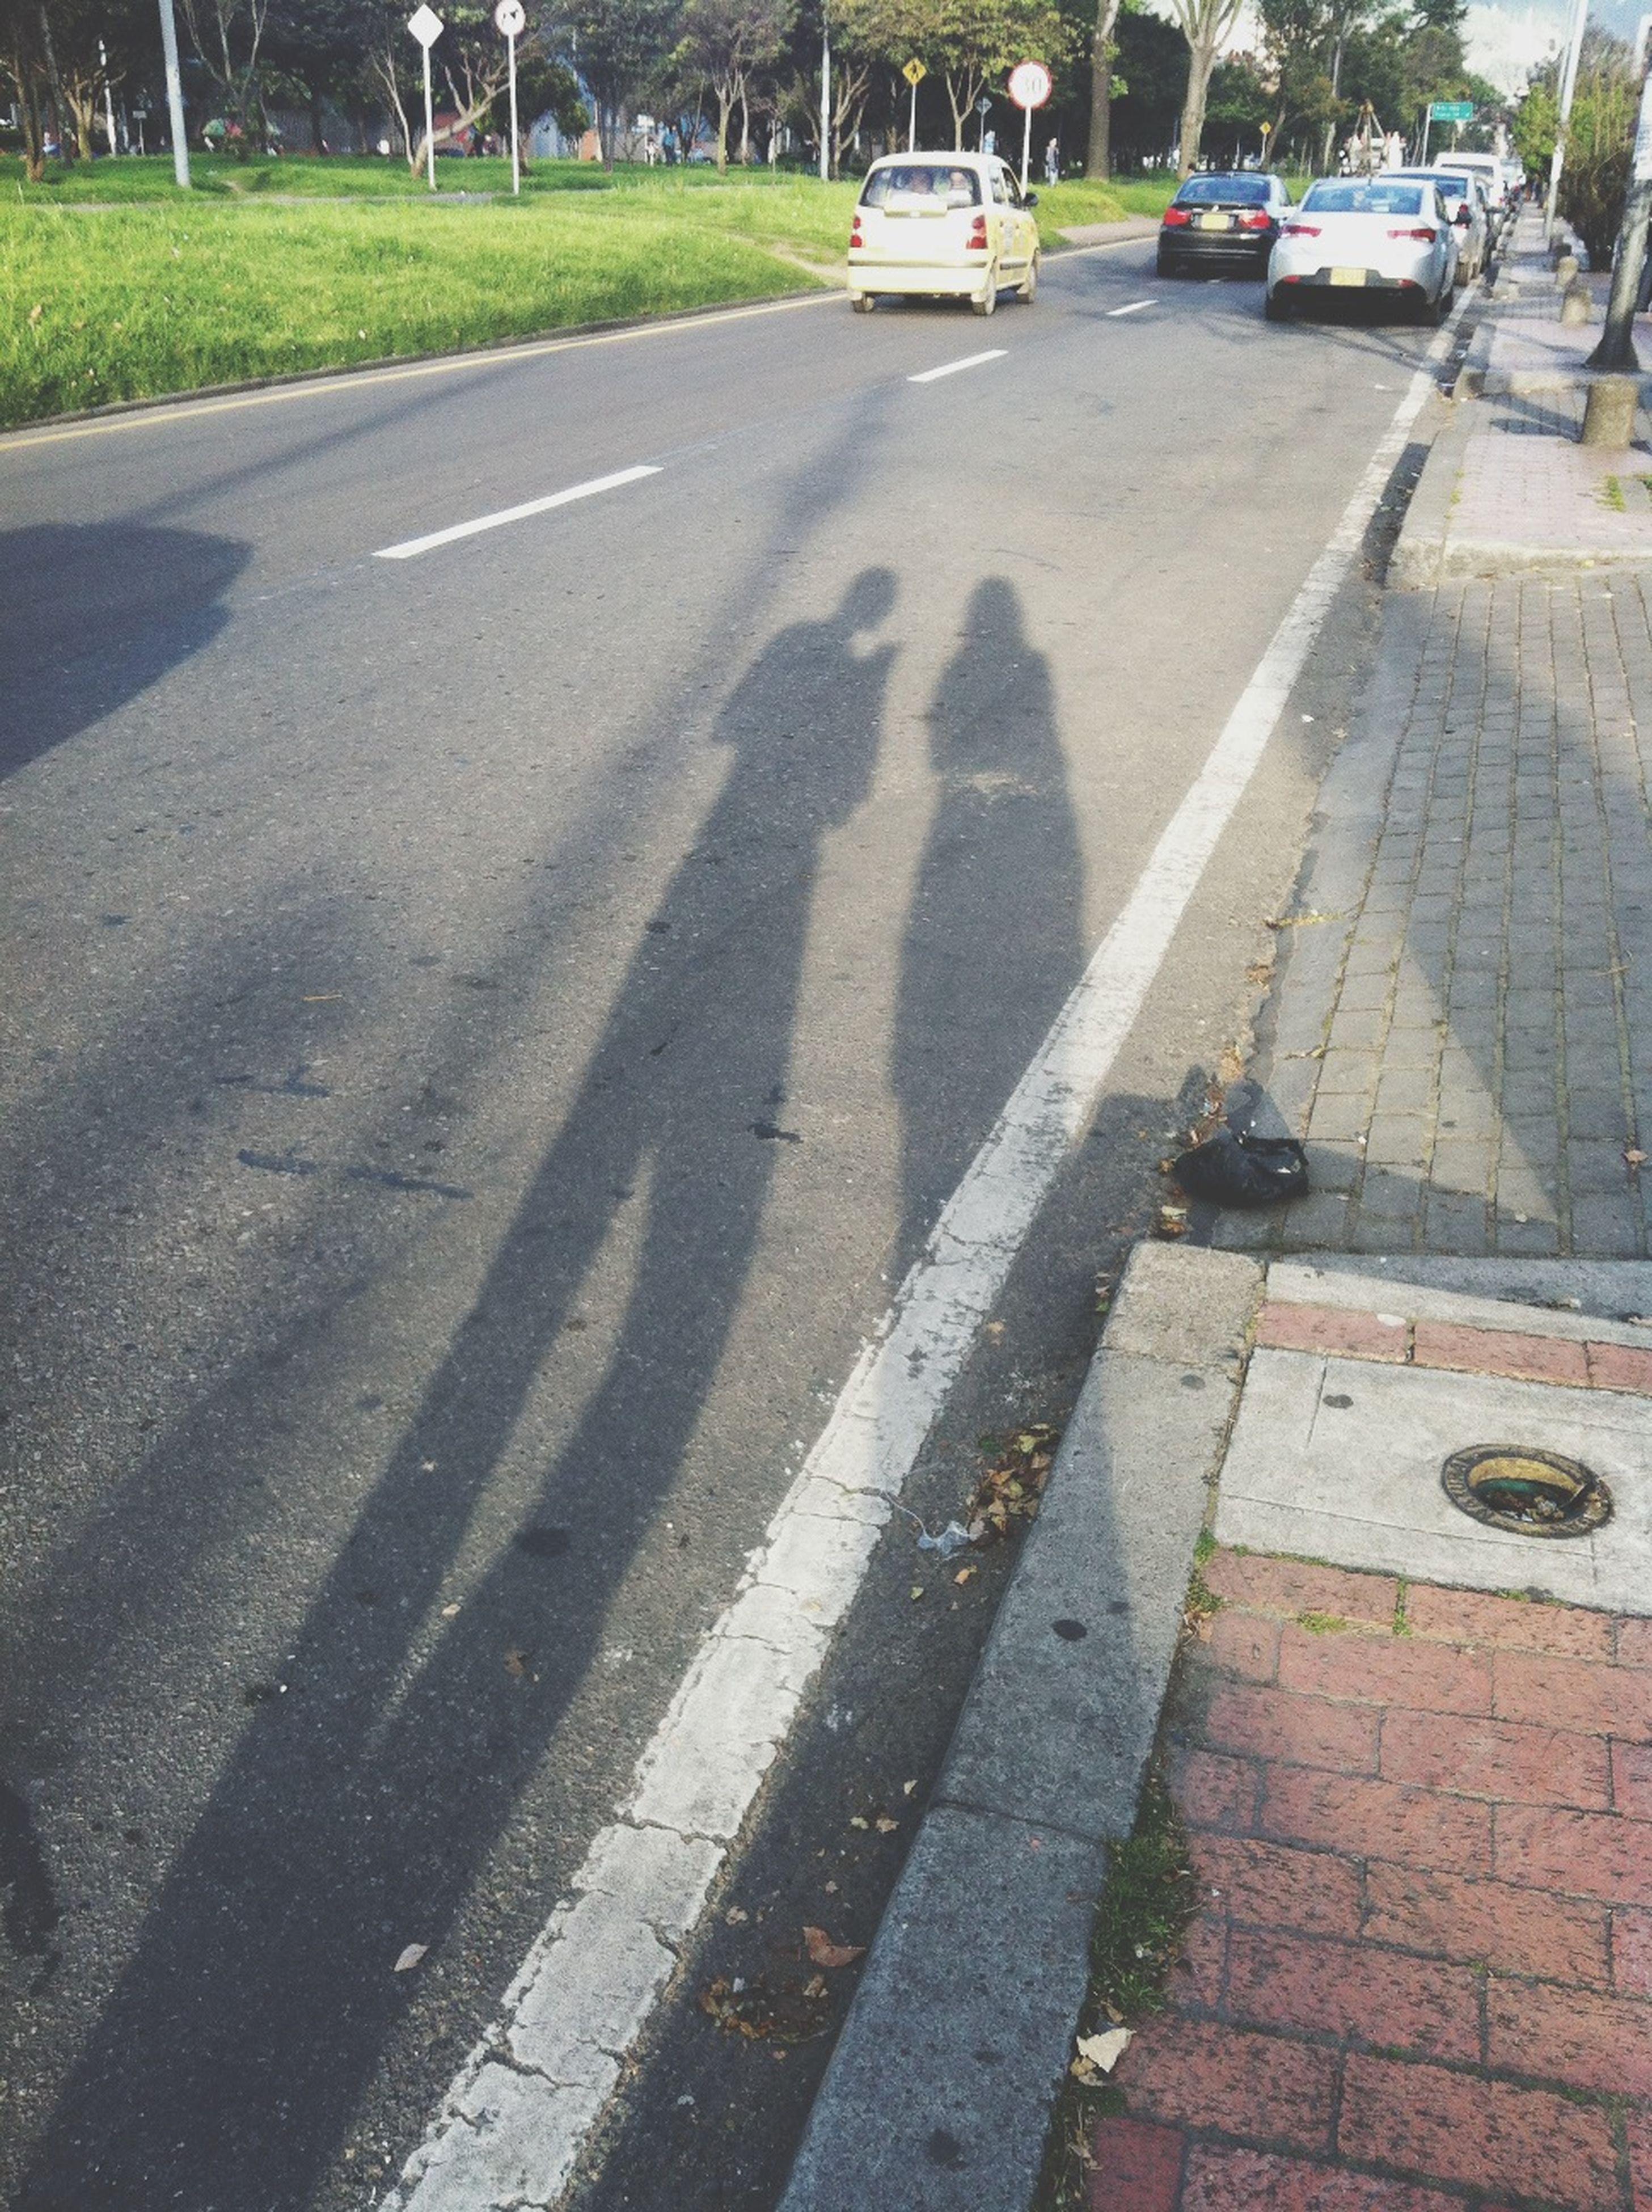 street, transportation, road, road marking, asphalt, shadow, car, land vehicle, high angle view, the way forward, sunlight, day, zebra crossing, city, outdoors, city street, city life, sidewalk, incidental people